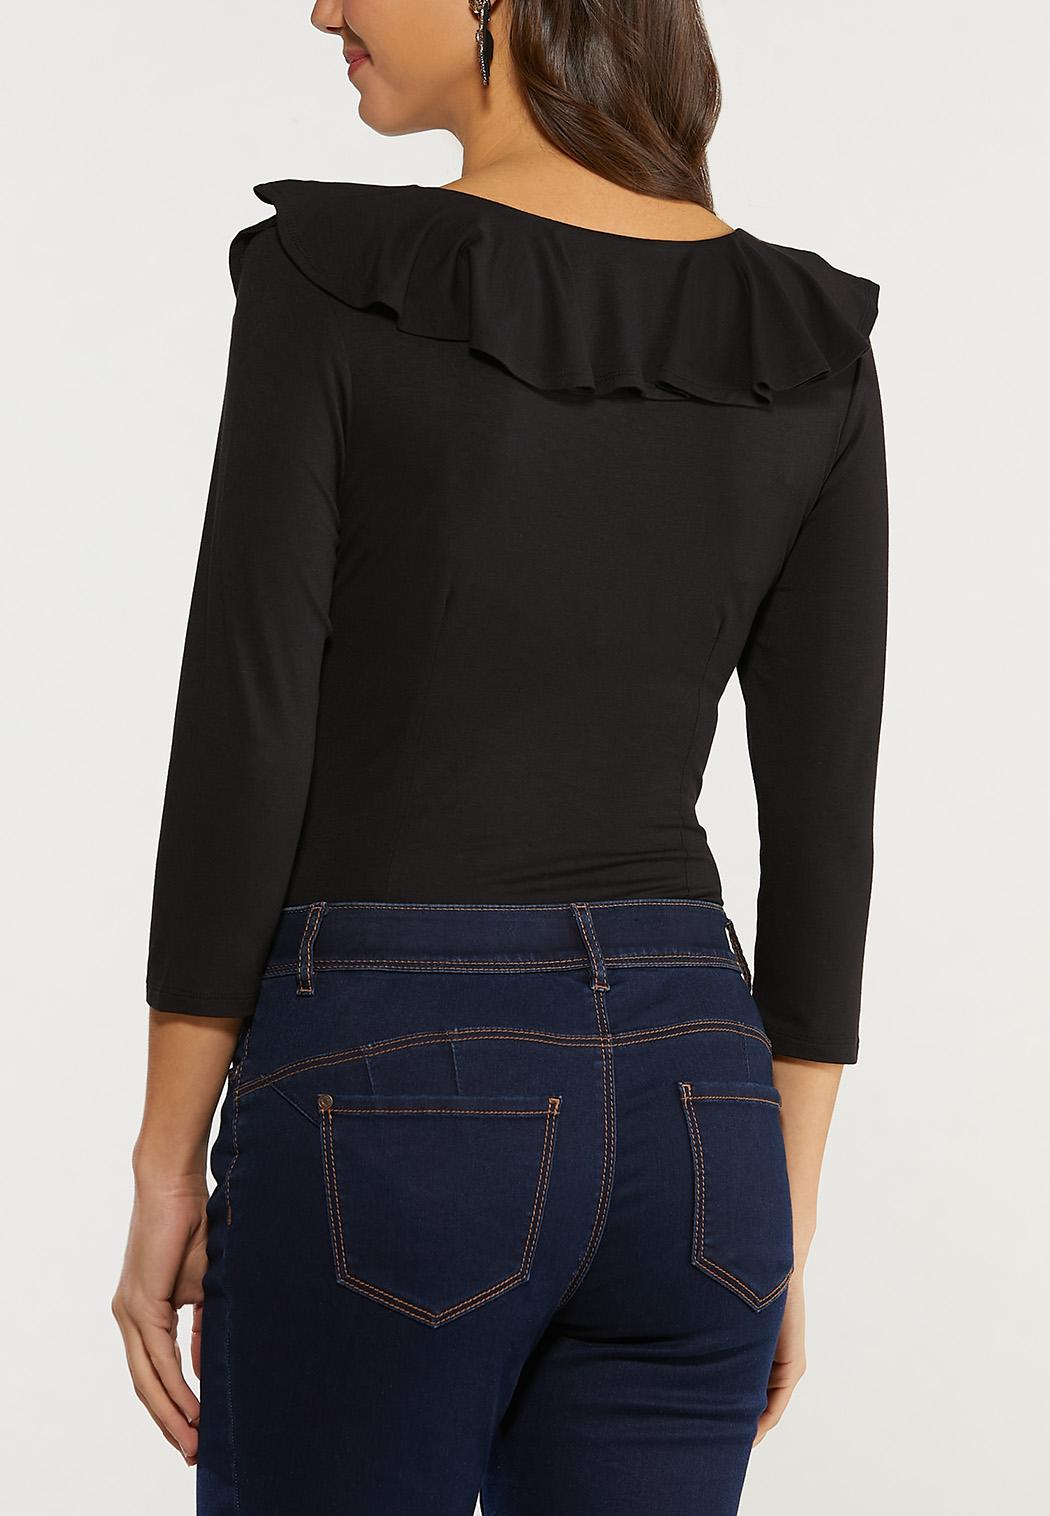 Plus Size Ruffled V-Neck Bodysuit (Item #44493544)